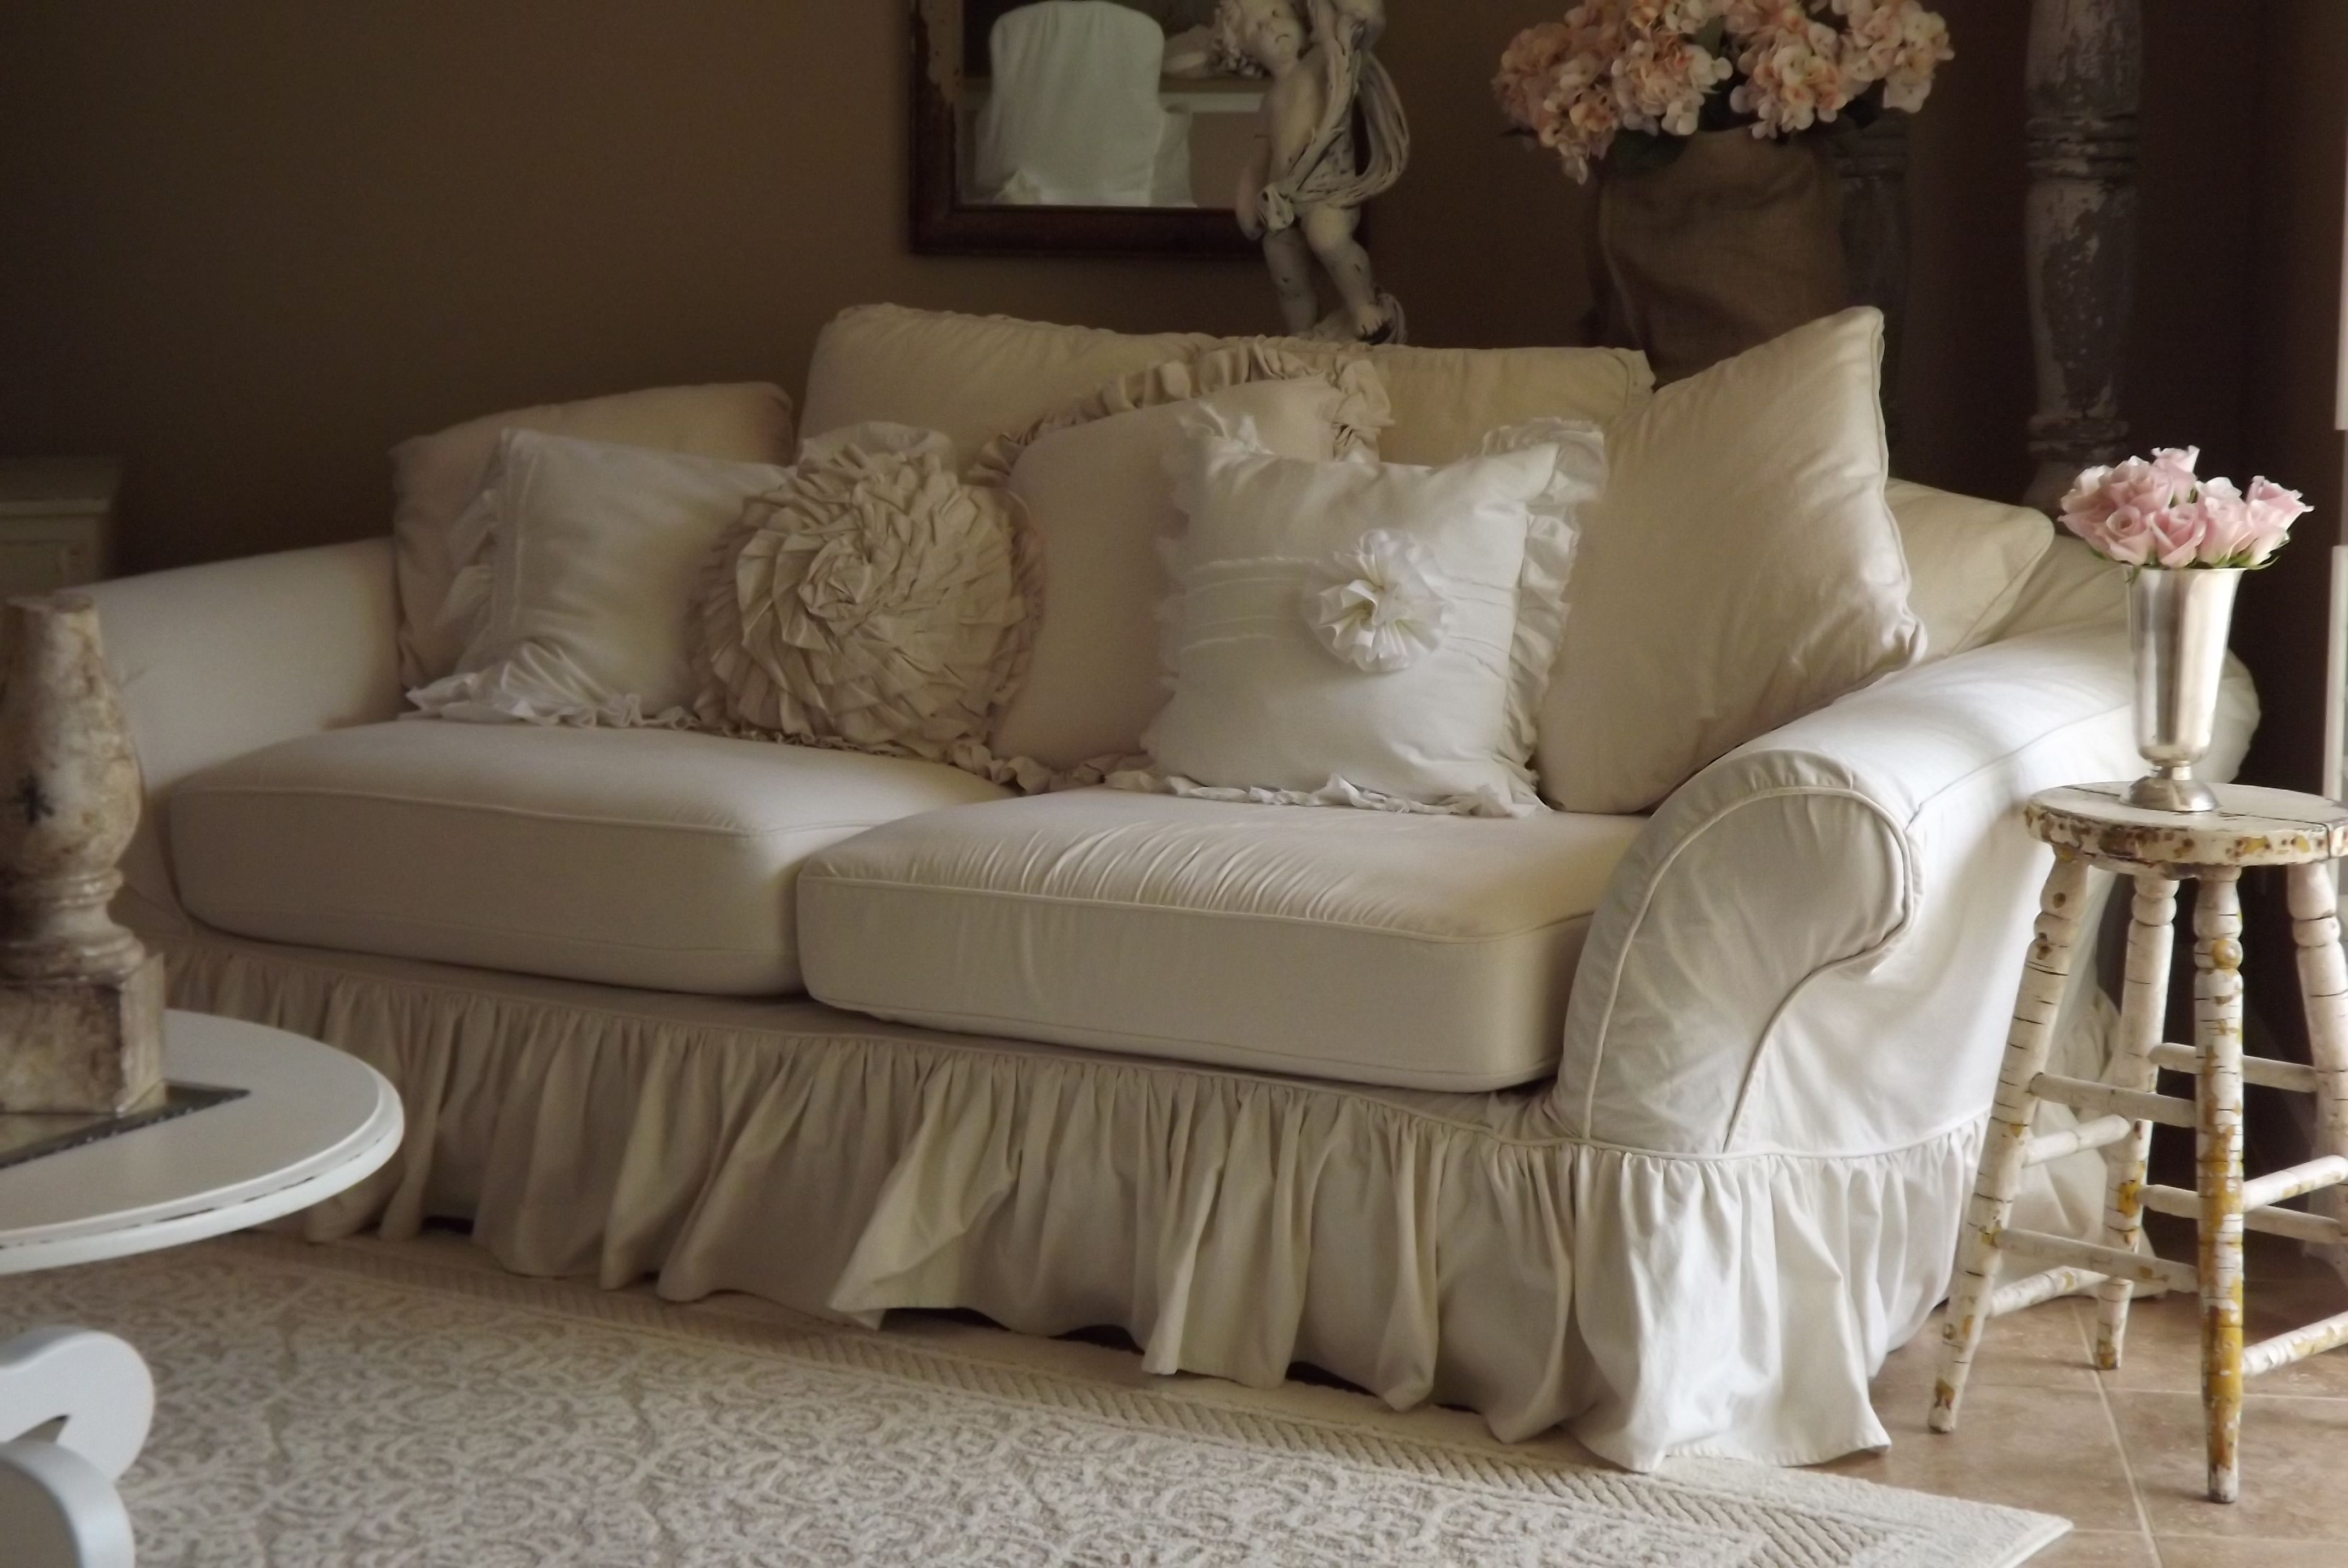 6a0120a739a9b3970b015393086ded970b pi 4288x2864 shabby chic couch vintage shabby chic